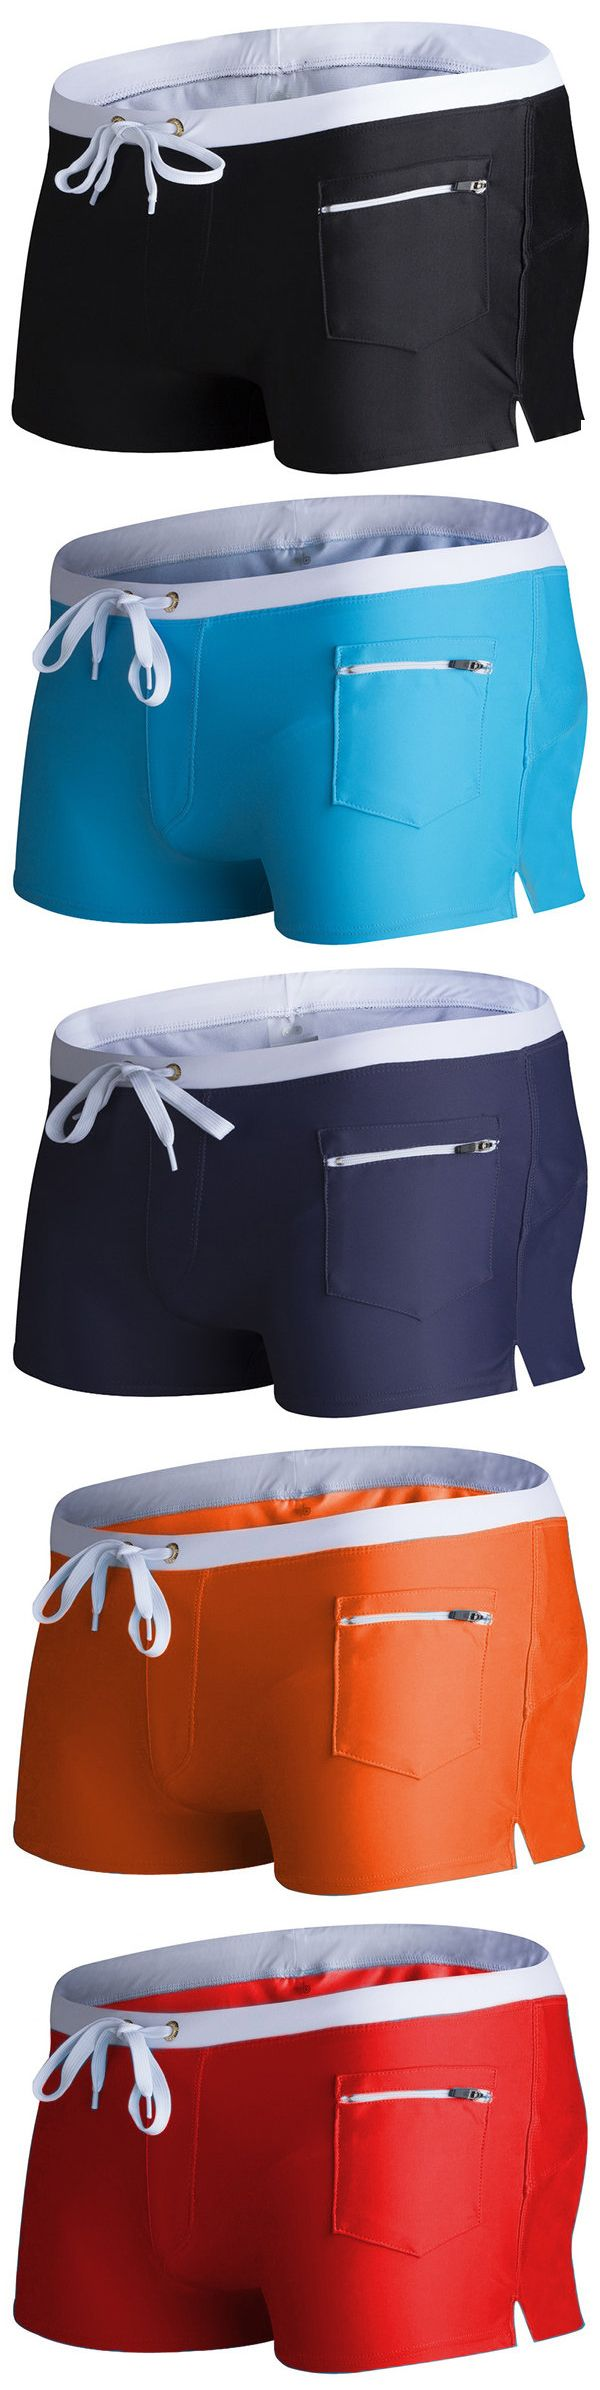 Sexy Swimming Hot Spring Low Waist Zipper Pocket Swim Trunks Beach Shorts for Men